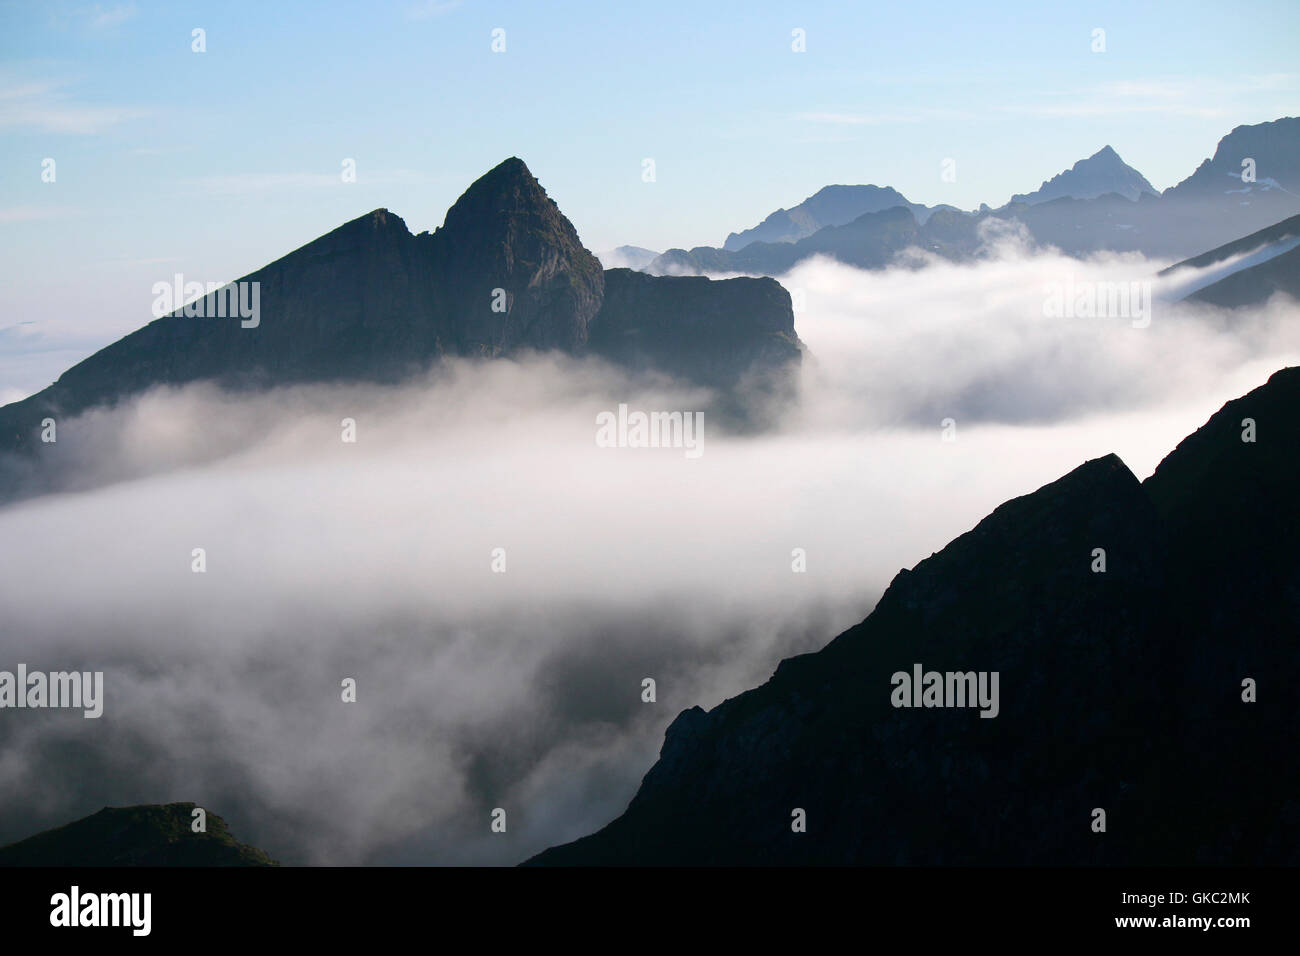 Impressionen: Reinebringen, Reinefjord, Lofoten, Norwegen. - Stock Image